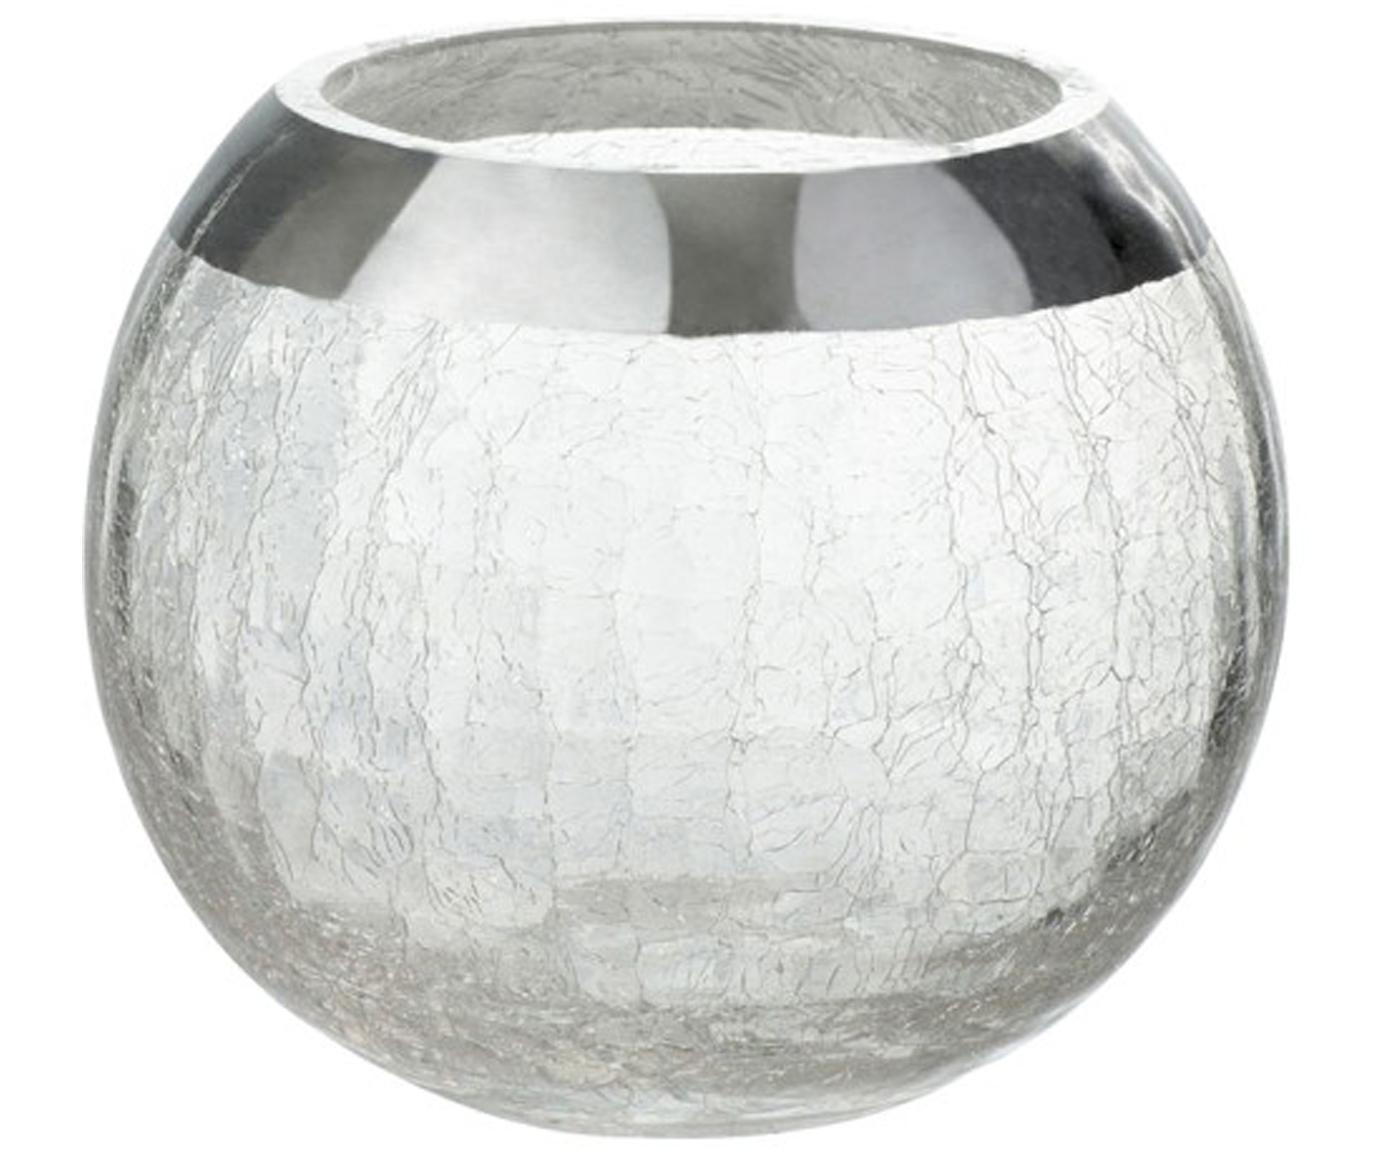 Portalumini Lackle, Vetro verniciato, Trasparente, argento, Ø 14 x Alt. 11 cm